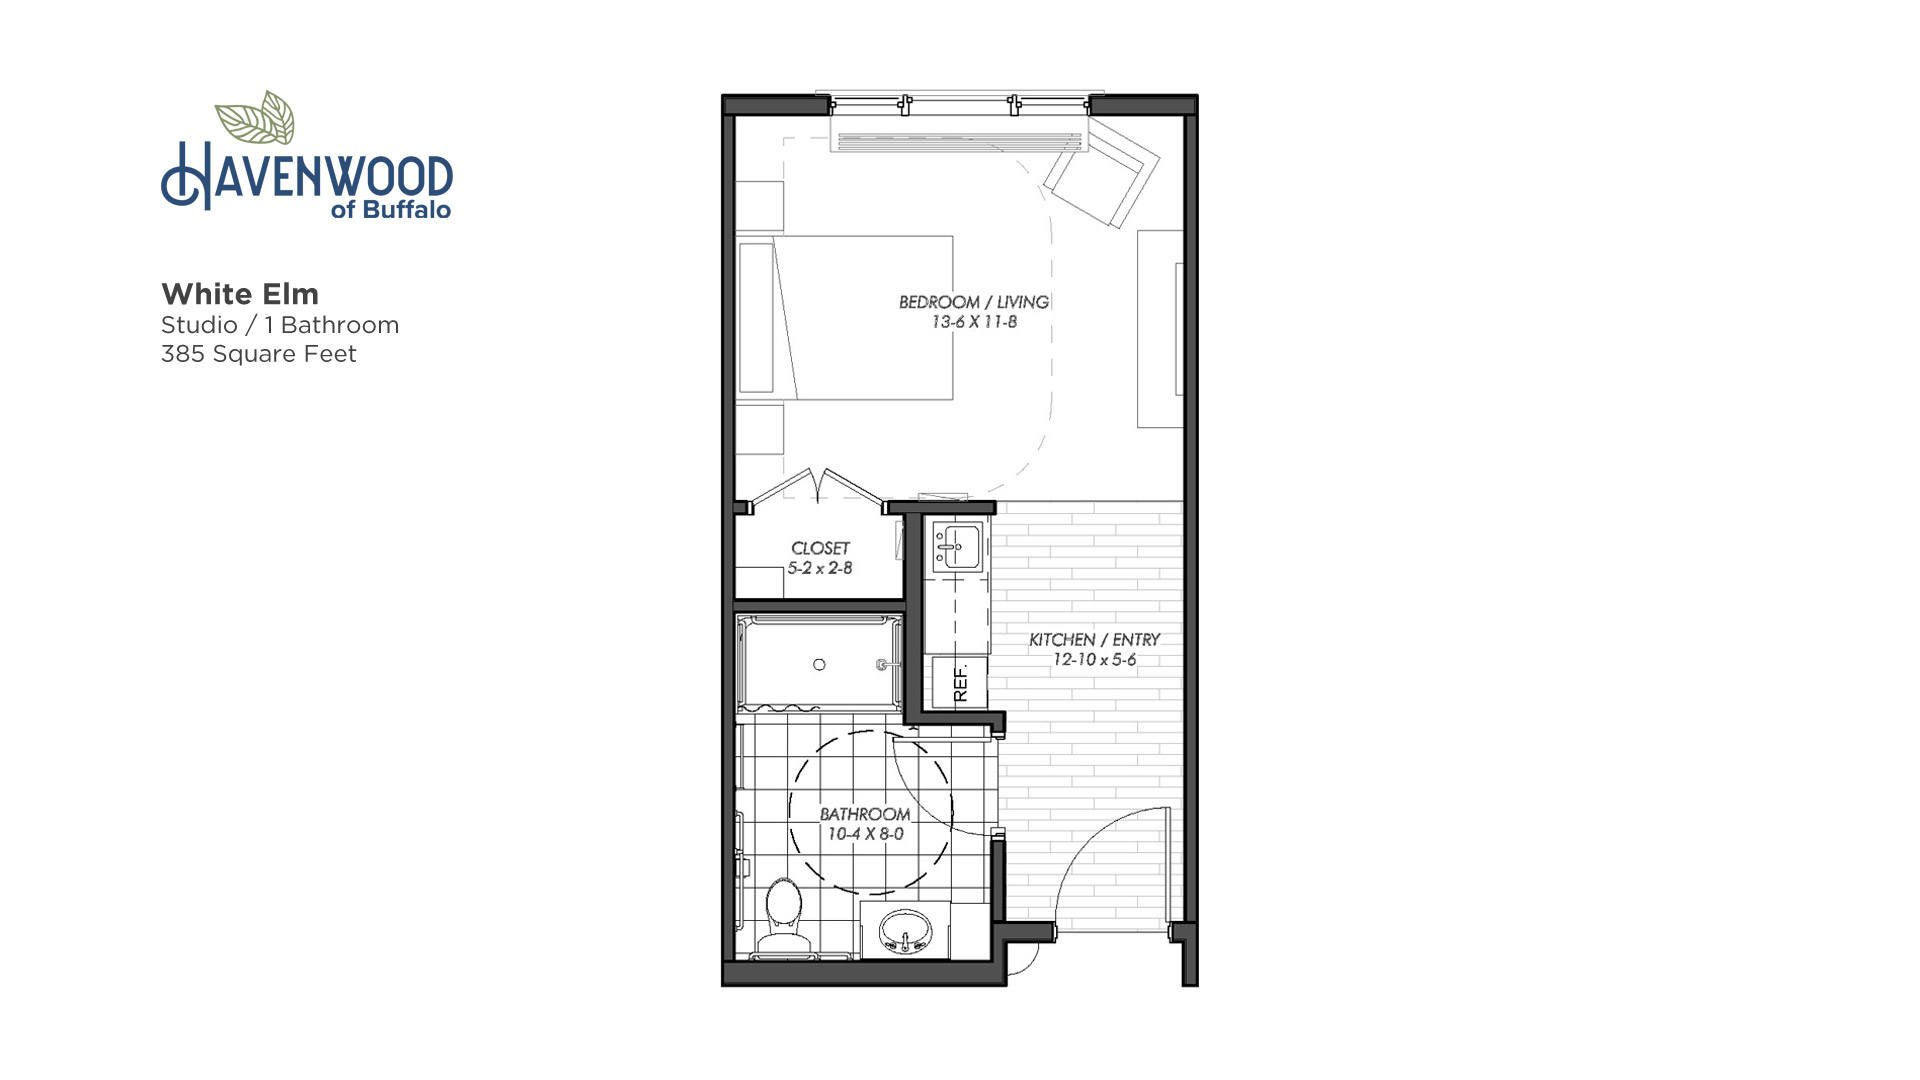 Havenwood of Buffalo White Elm Floor Plan